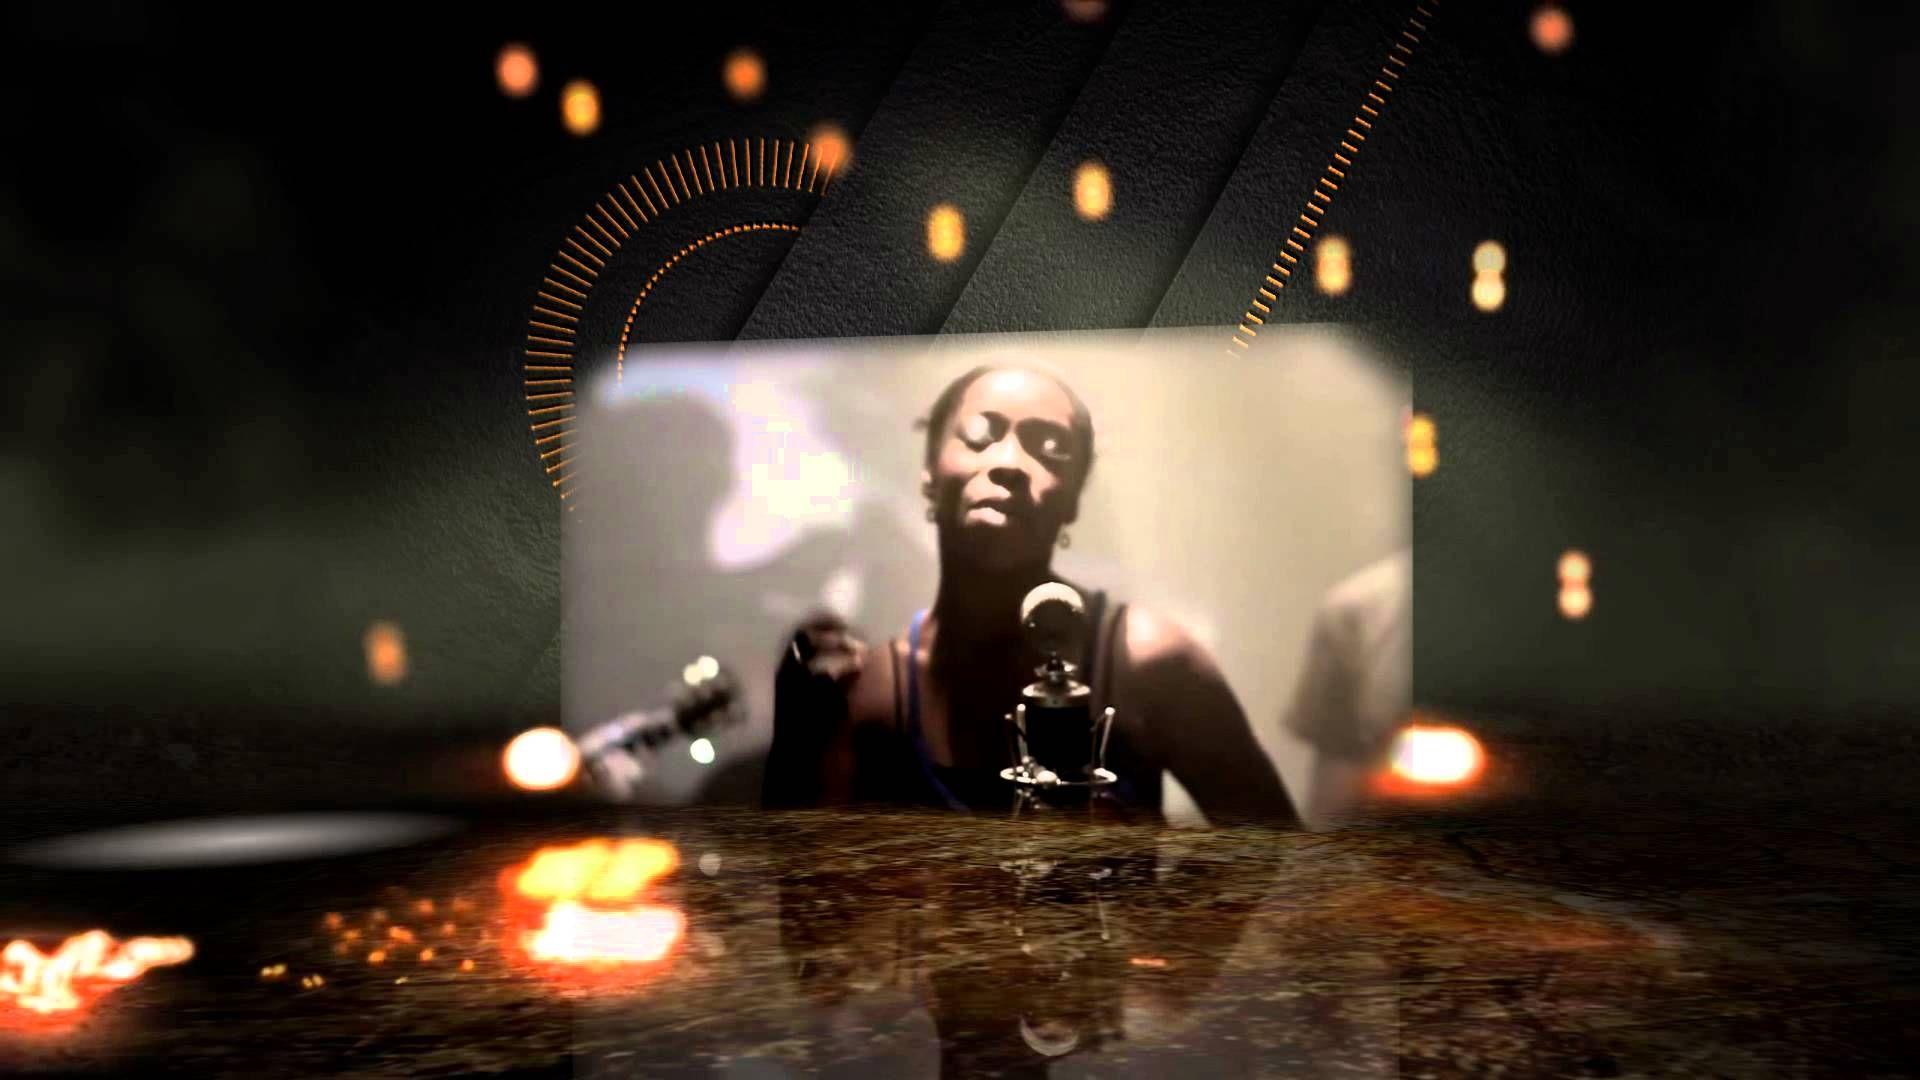 IYEOKA - SIMPLY FALLING (Sony Vegas Pro 12 Templates) | iyeoka ...